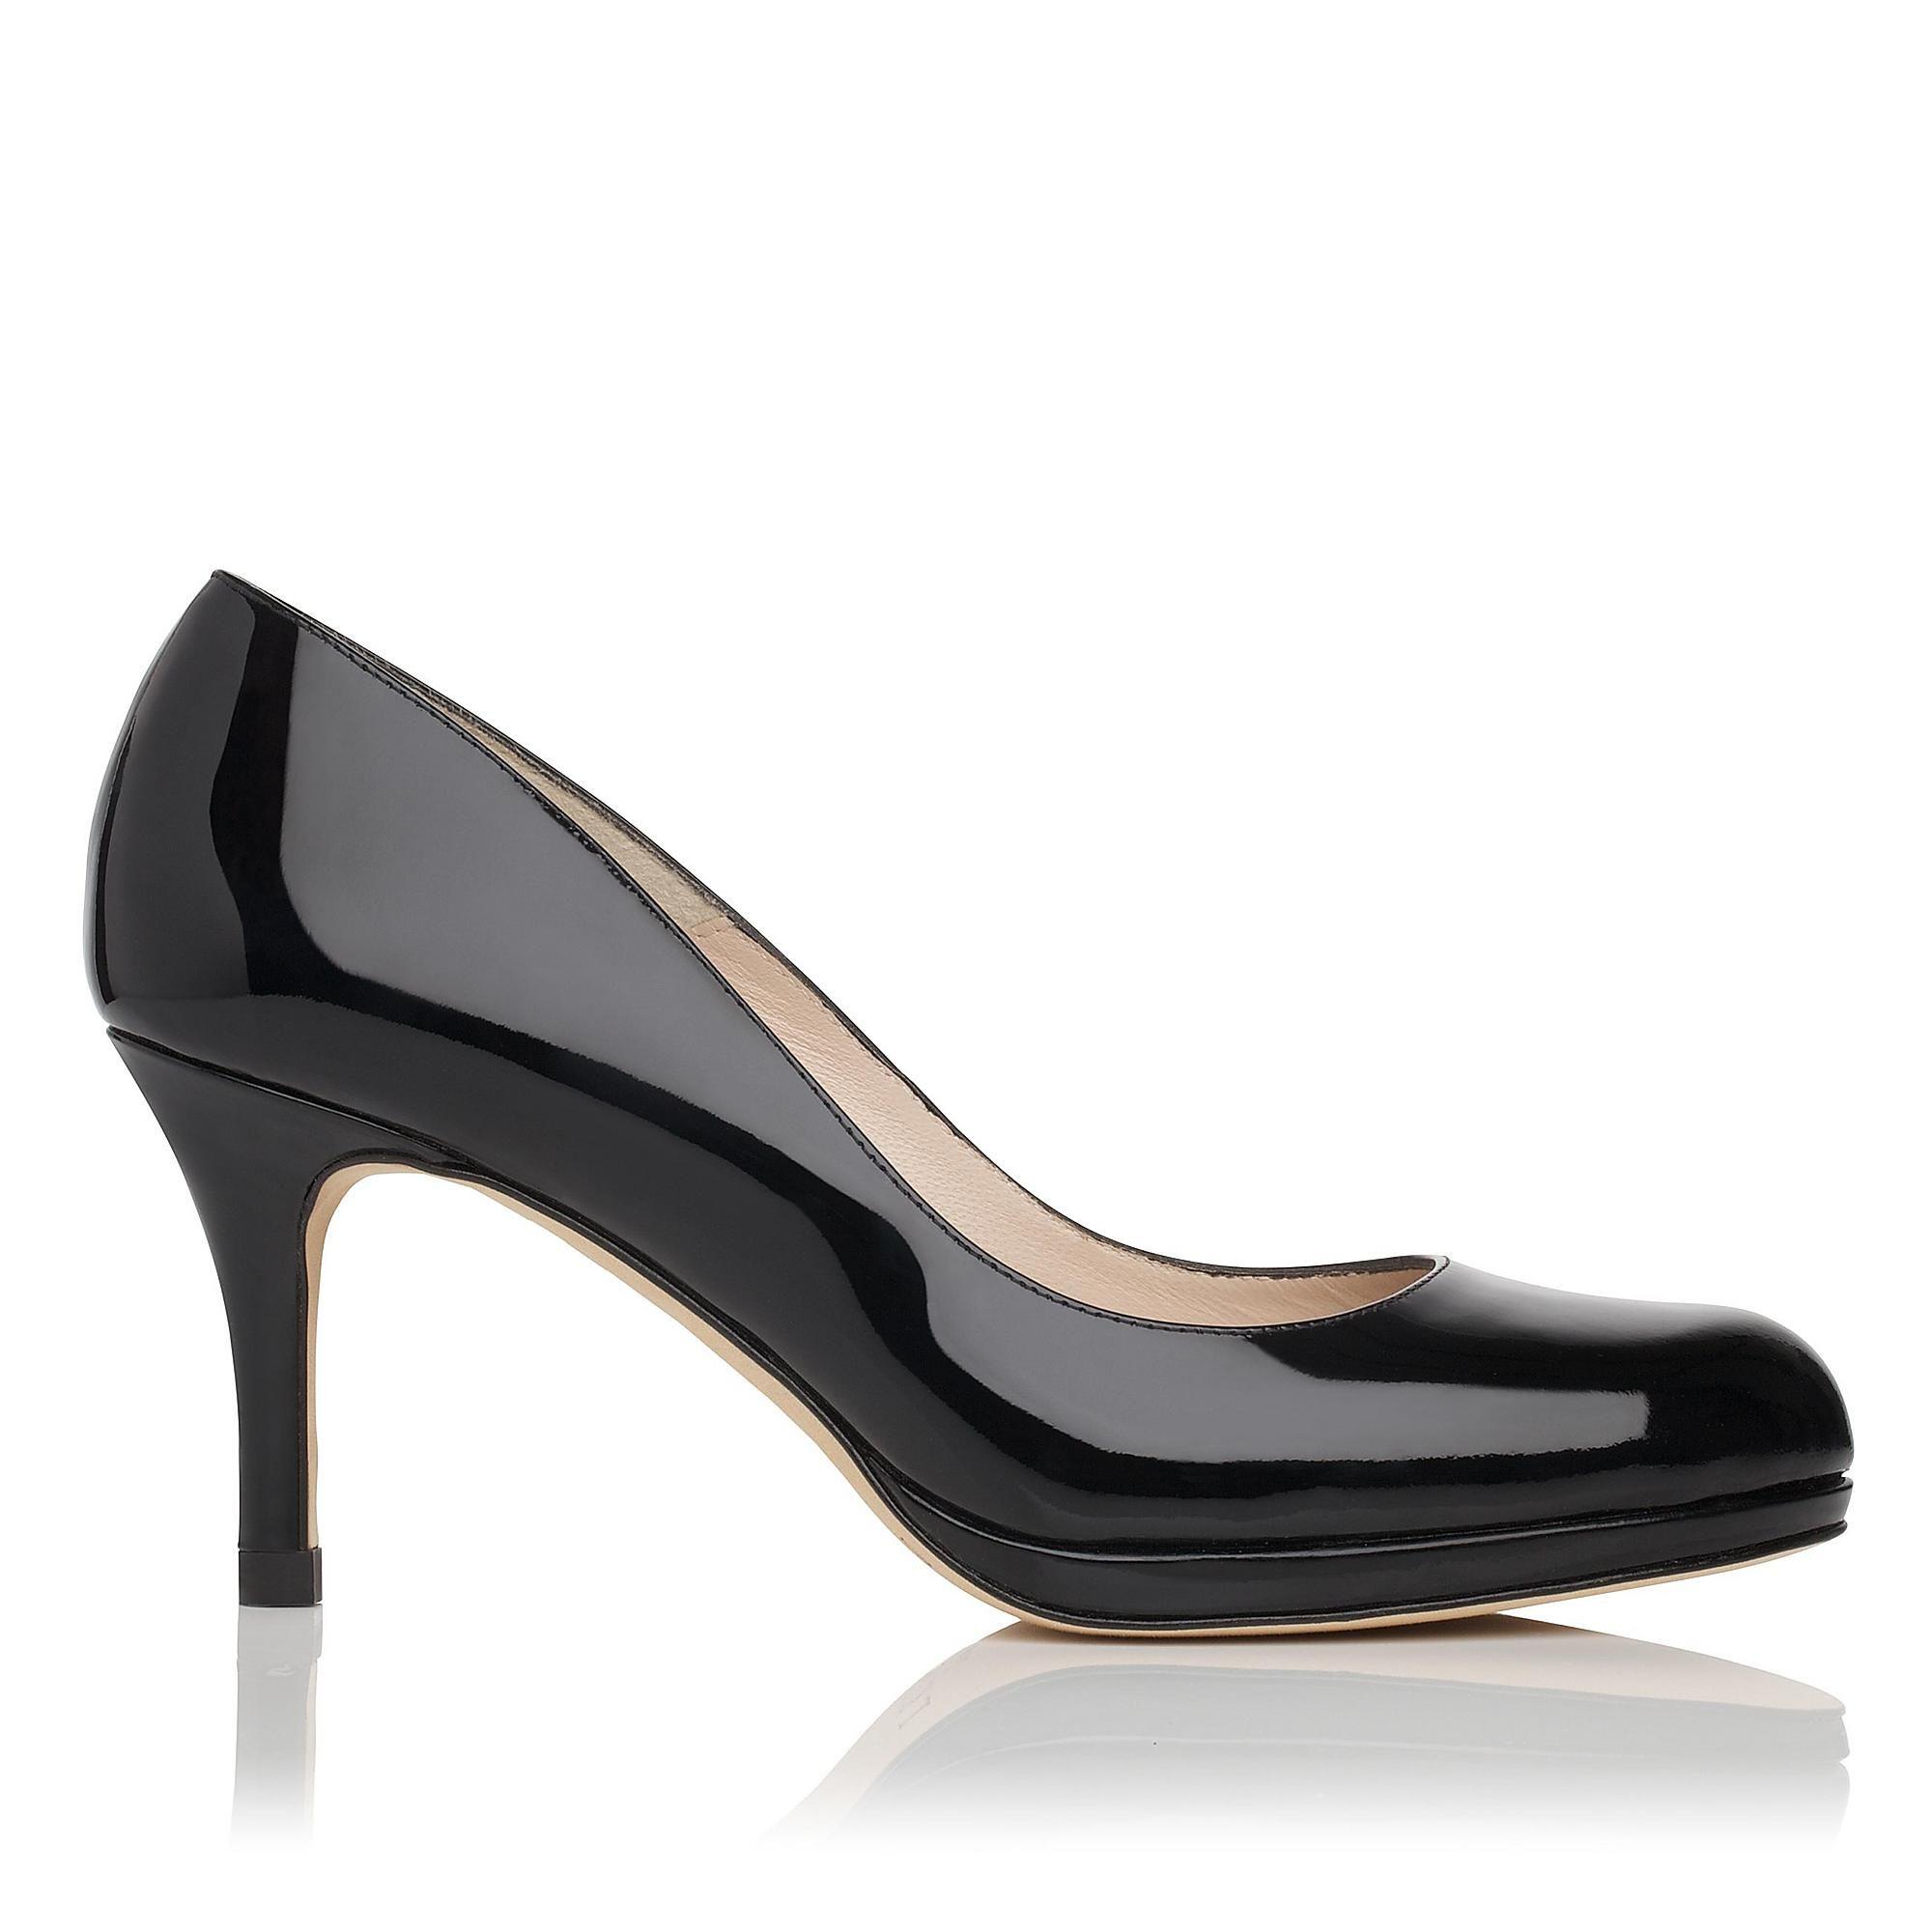 LK BENNETT | Sybila Patent Leather Platform Court Shoe in black | Patent  leather upper,